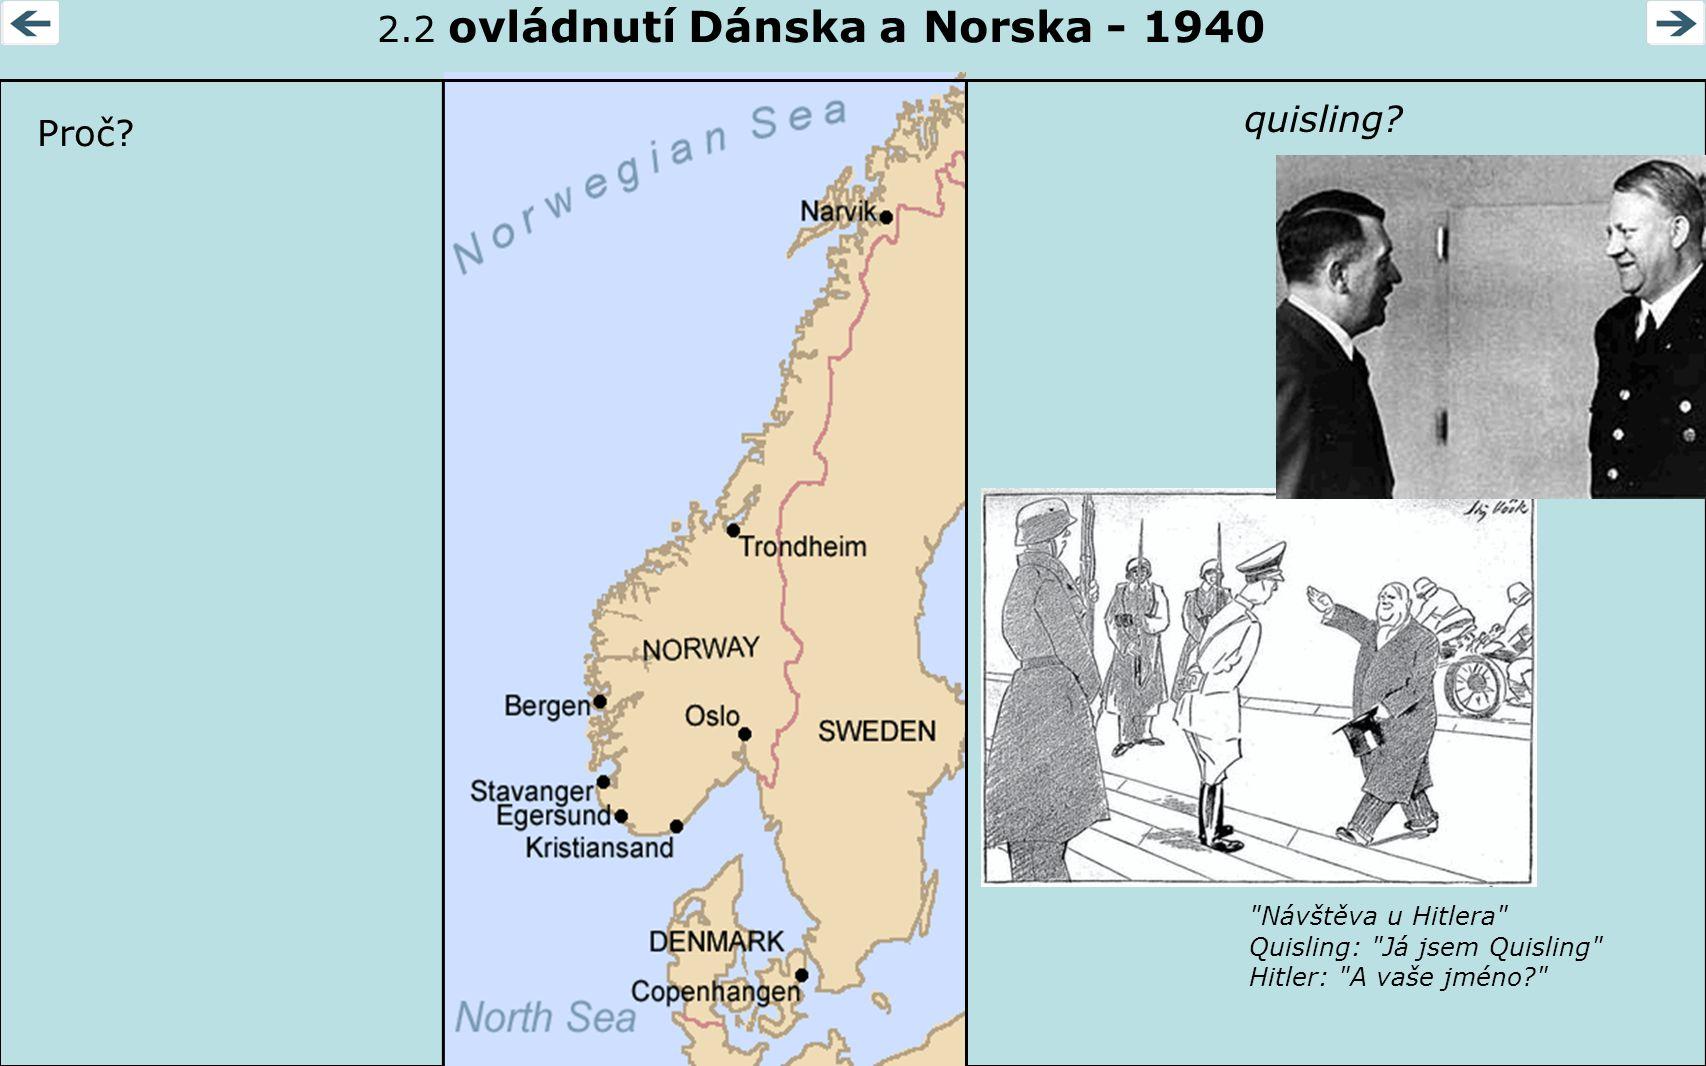 2.2 ovládnutí Dánska a Norska - 1940